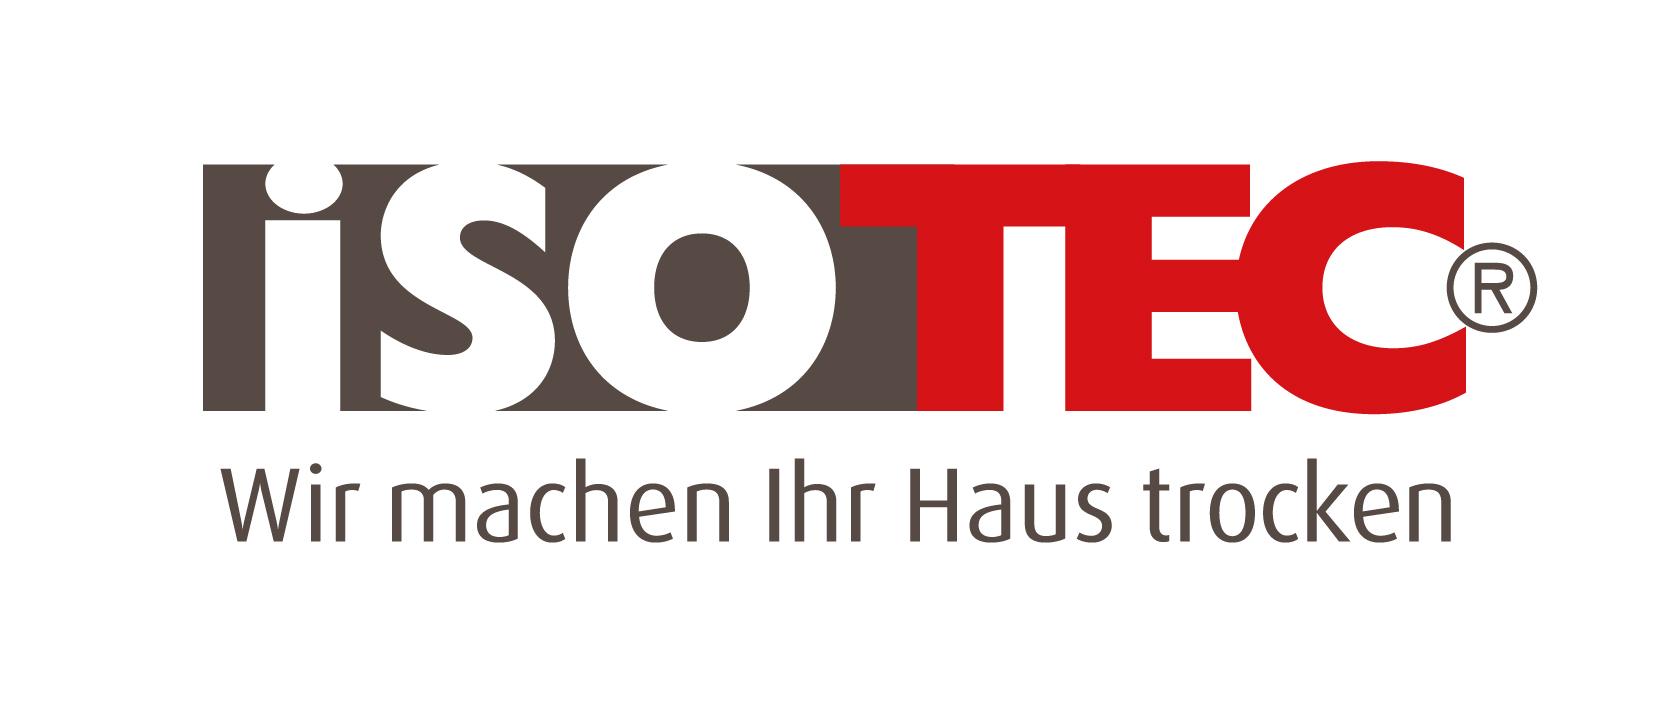 ISOTEC-Fachbetrieb Gebr. Becker GmbH Logo